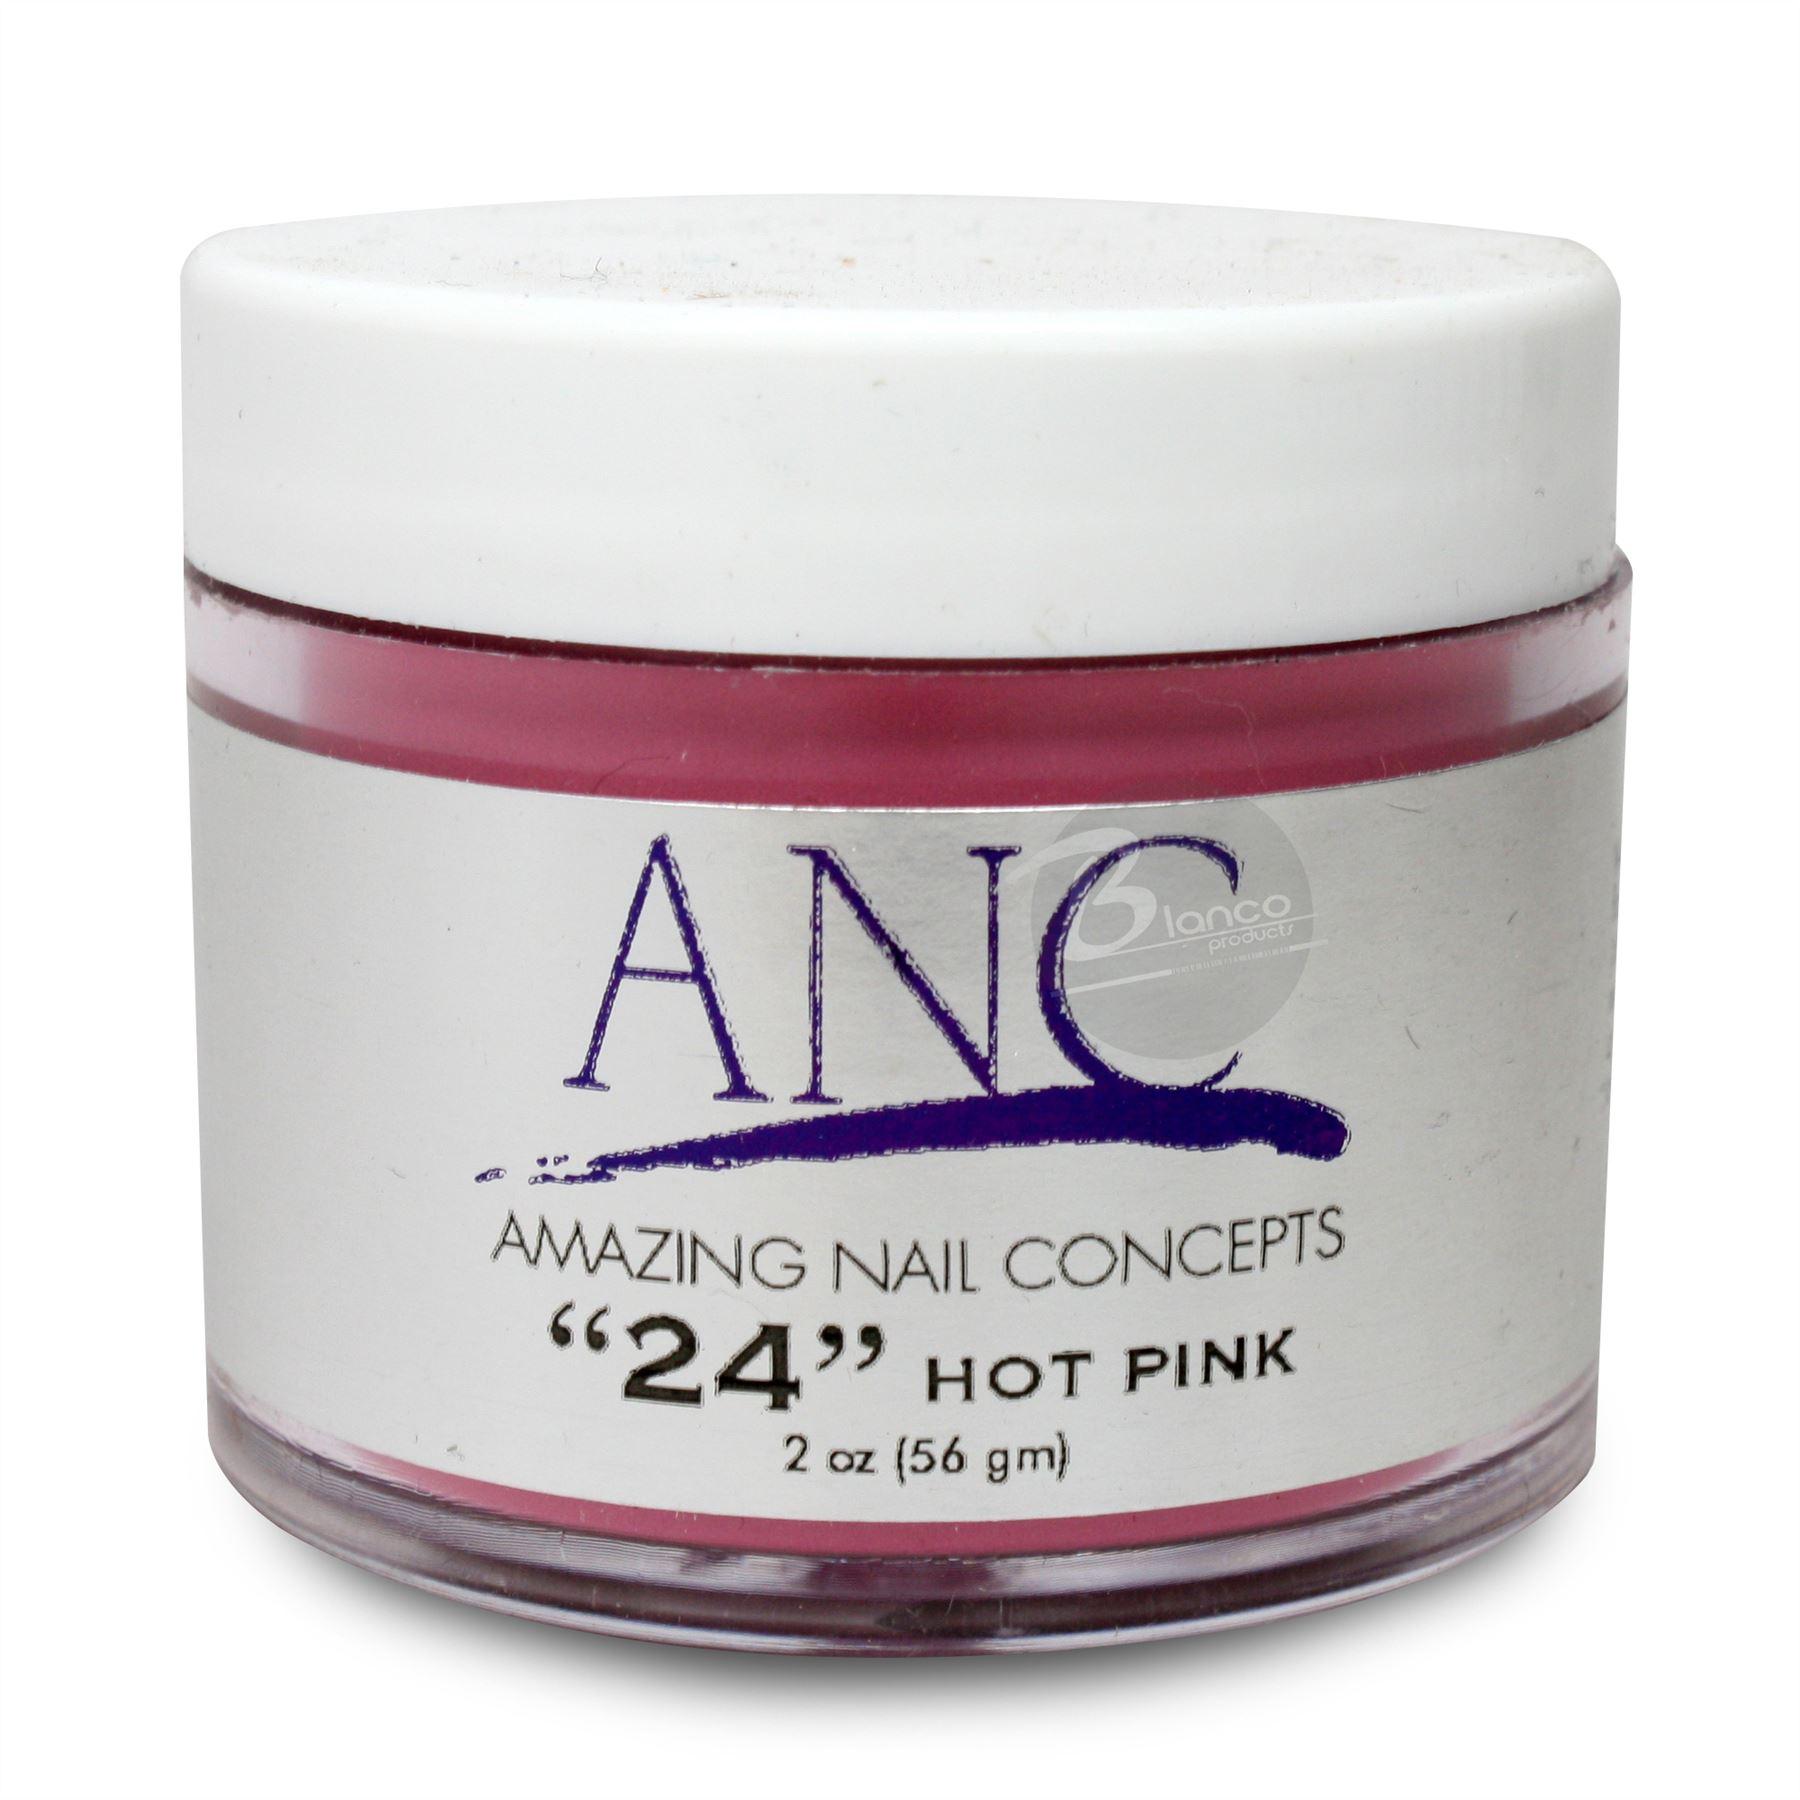 "Amazing Nail Concepts DIP Powder System ""Hot Pink"" #24 2oz"